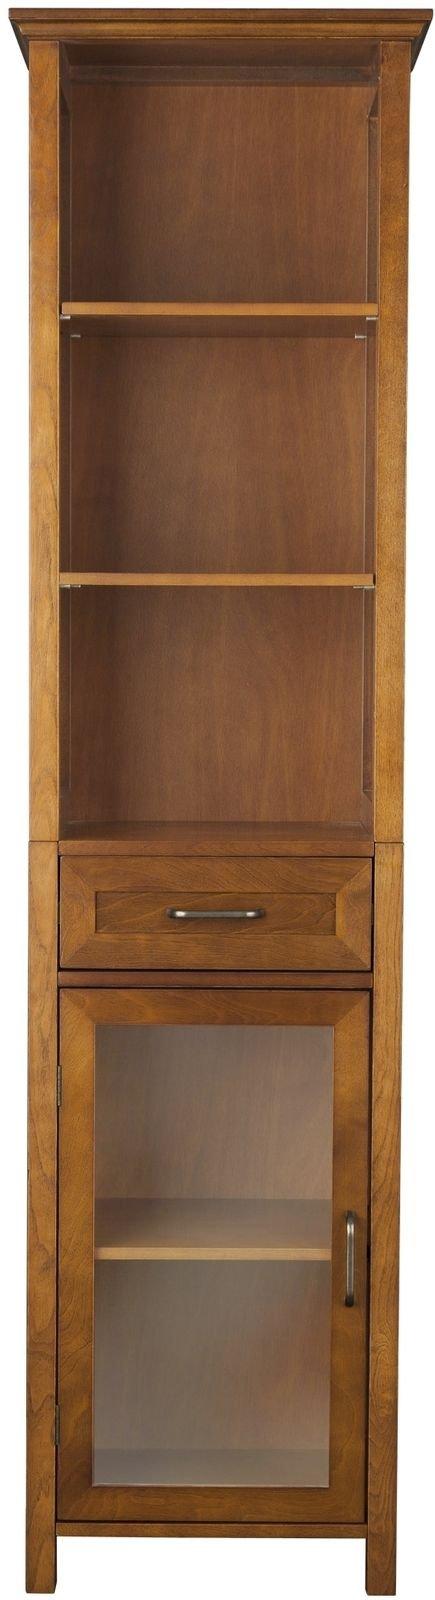 Lana45 Storage Cabinet Oak-Finish Linen Tower Storage Showcase Cabinet Wooden Home Furnishings